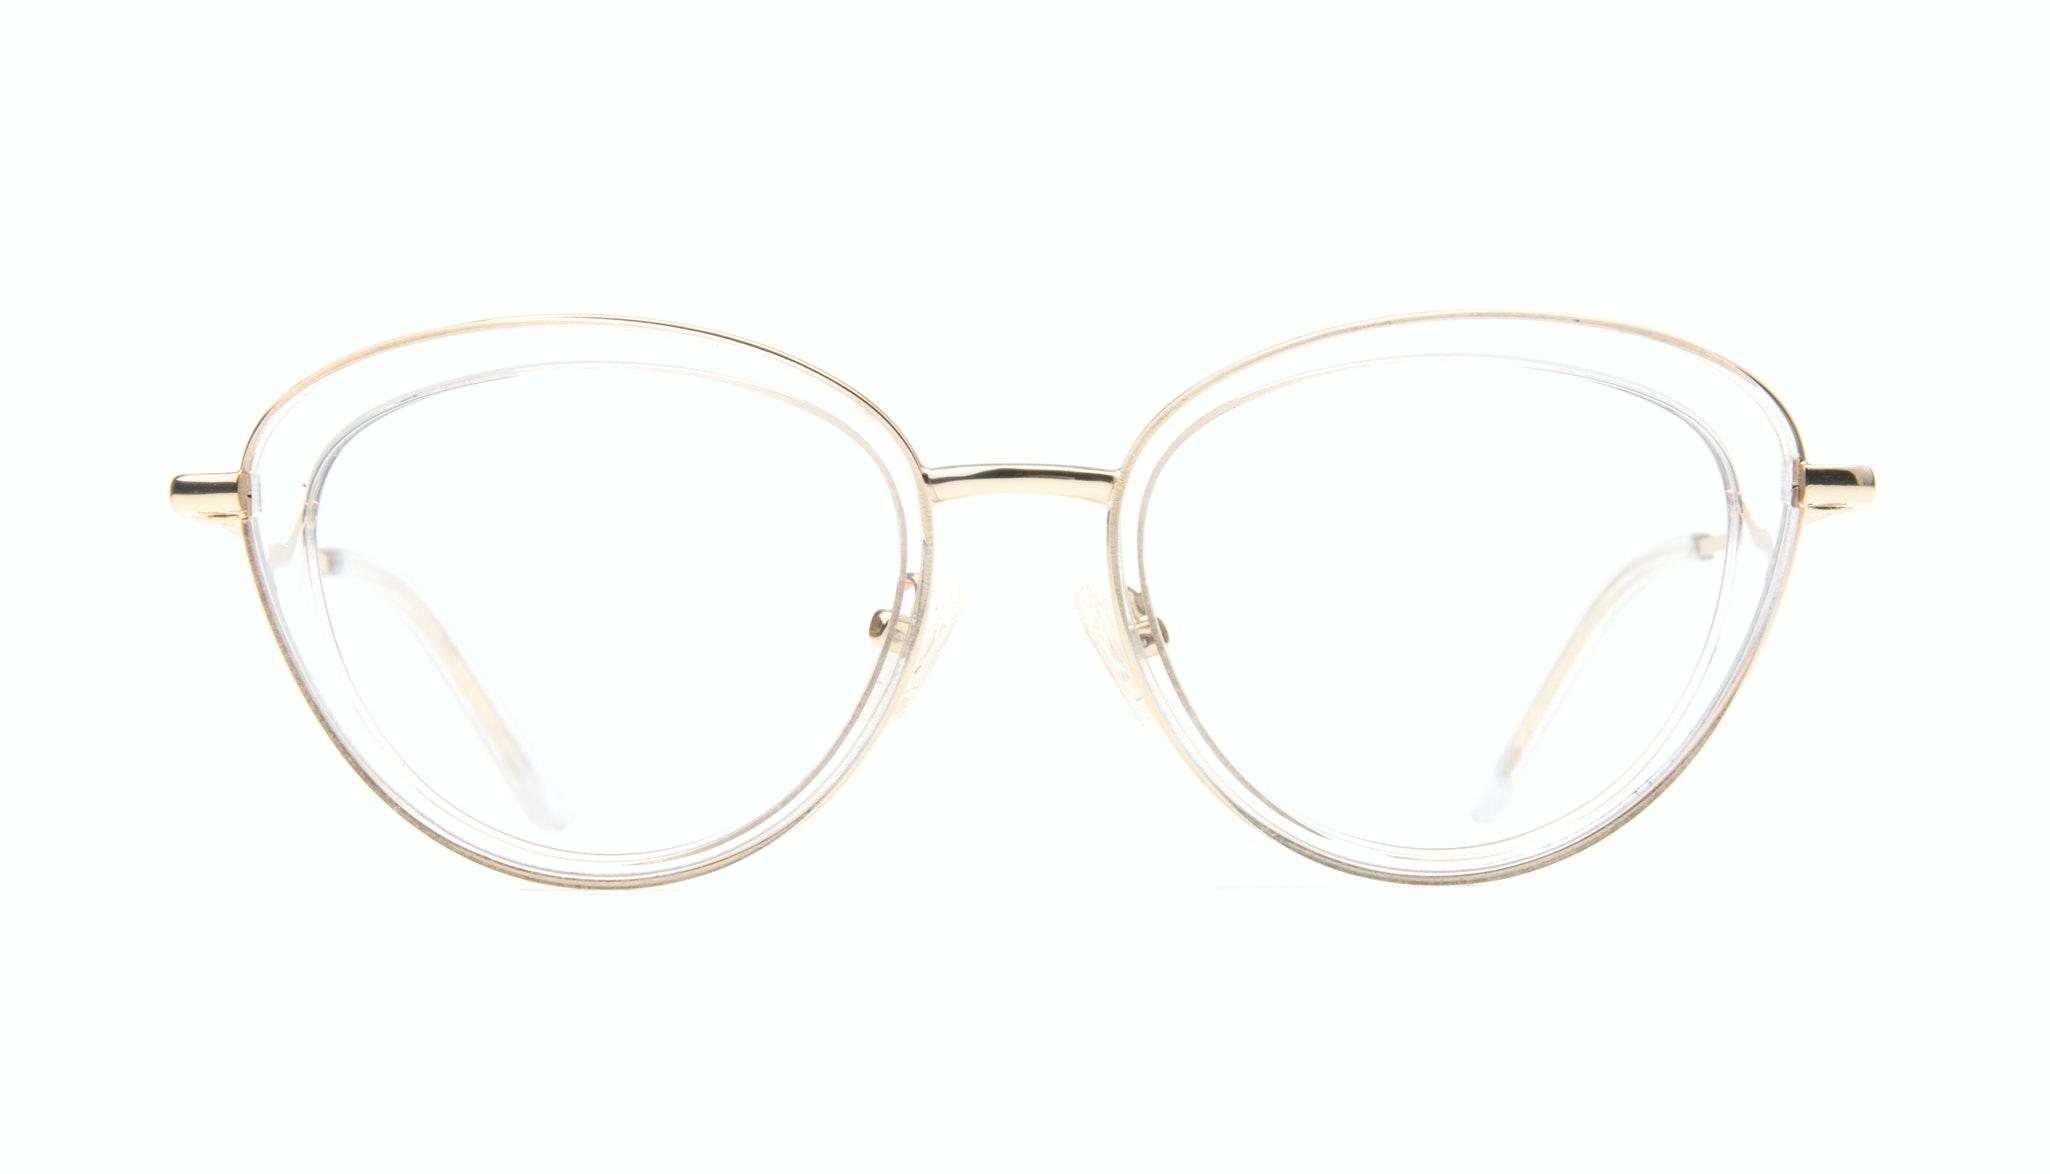 Affordable Fashion Glasses Cat Eye Eyeglasses Women Glory Gold Diamond Front